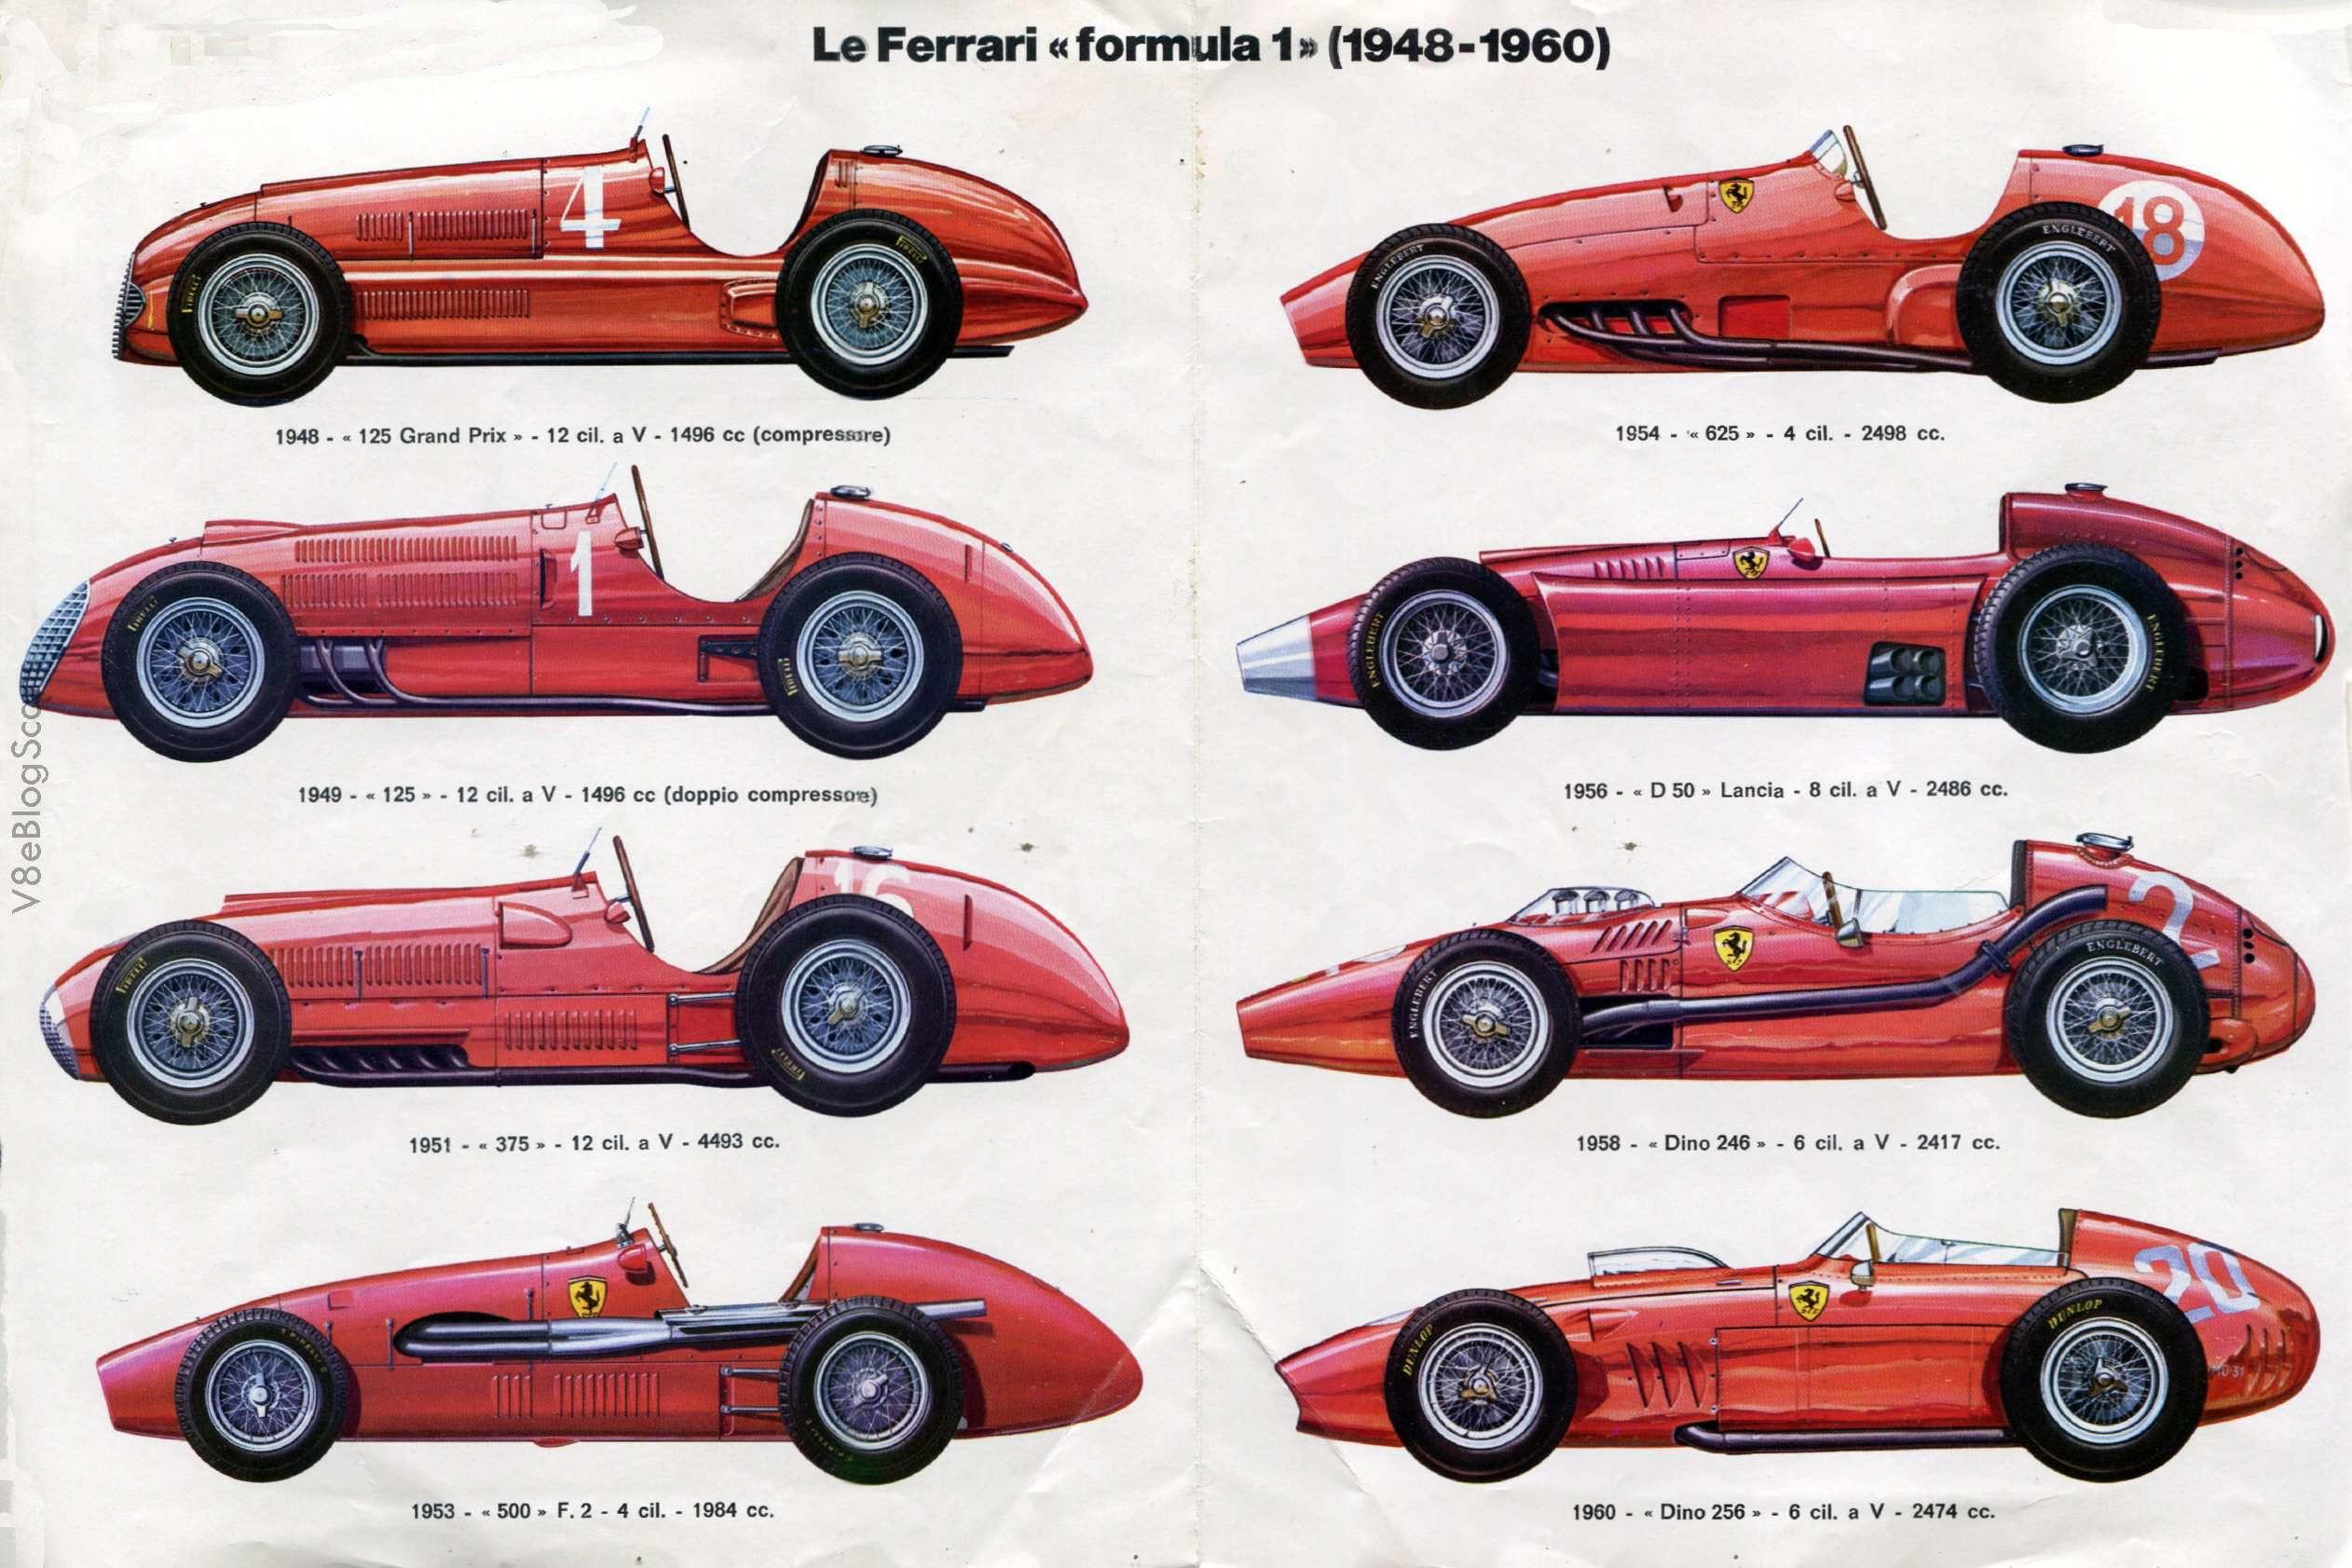 ferrari formula 1 1948 1960 ferrari pinterest cylindr e affiches r tro et voitures et motos. Black Bedroom Furniture Sets. Home Design Ideas